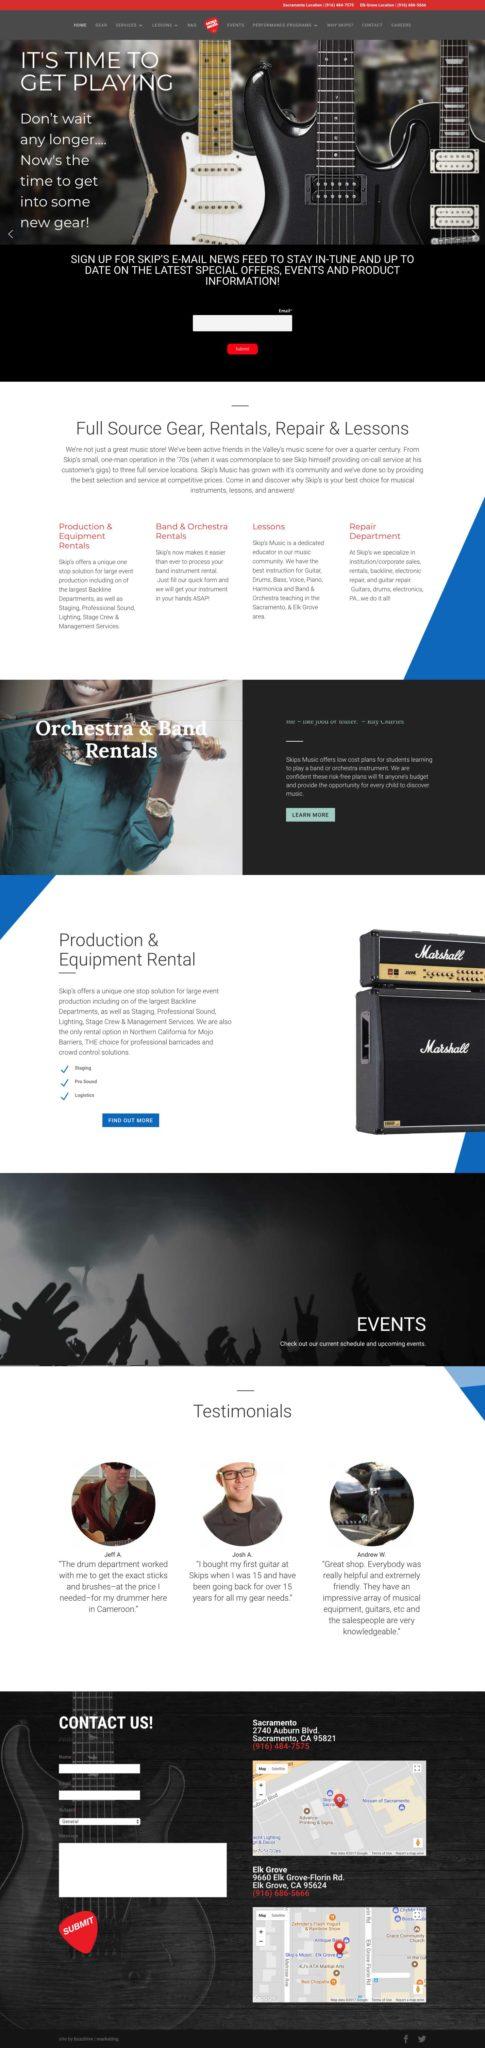 skipsmusic.com_ Standalone Pricing